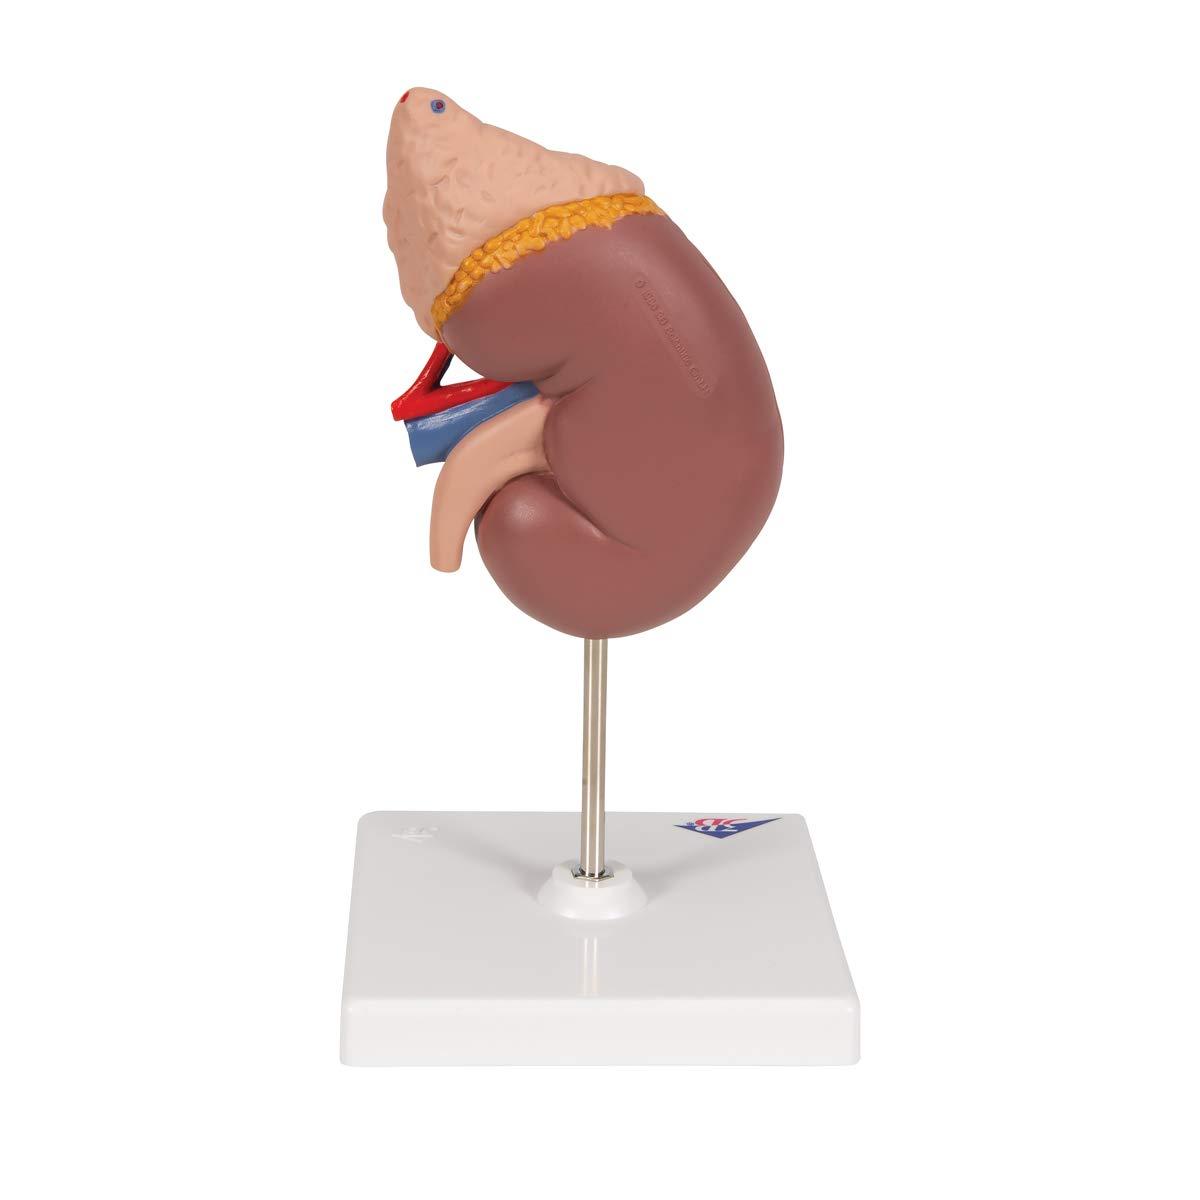 3b Scientific Human Anatomy Kidney Model With Adrenal Gland 2